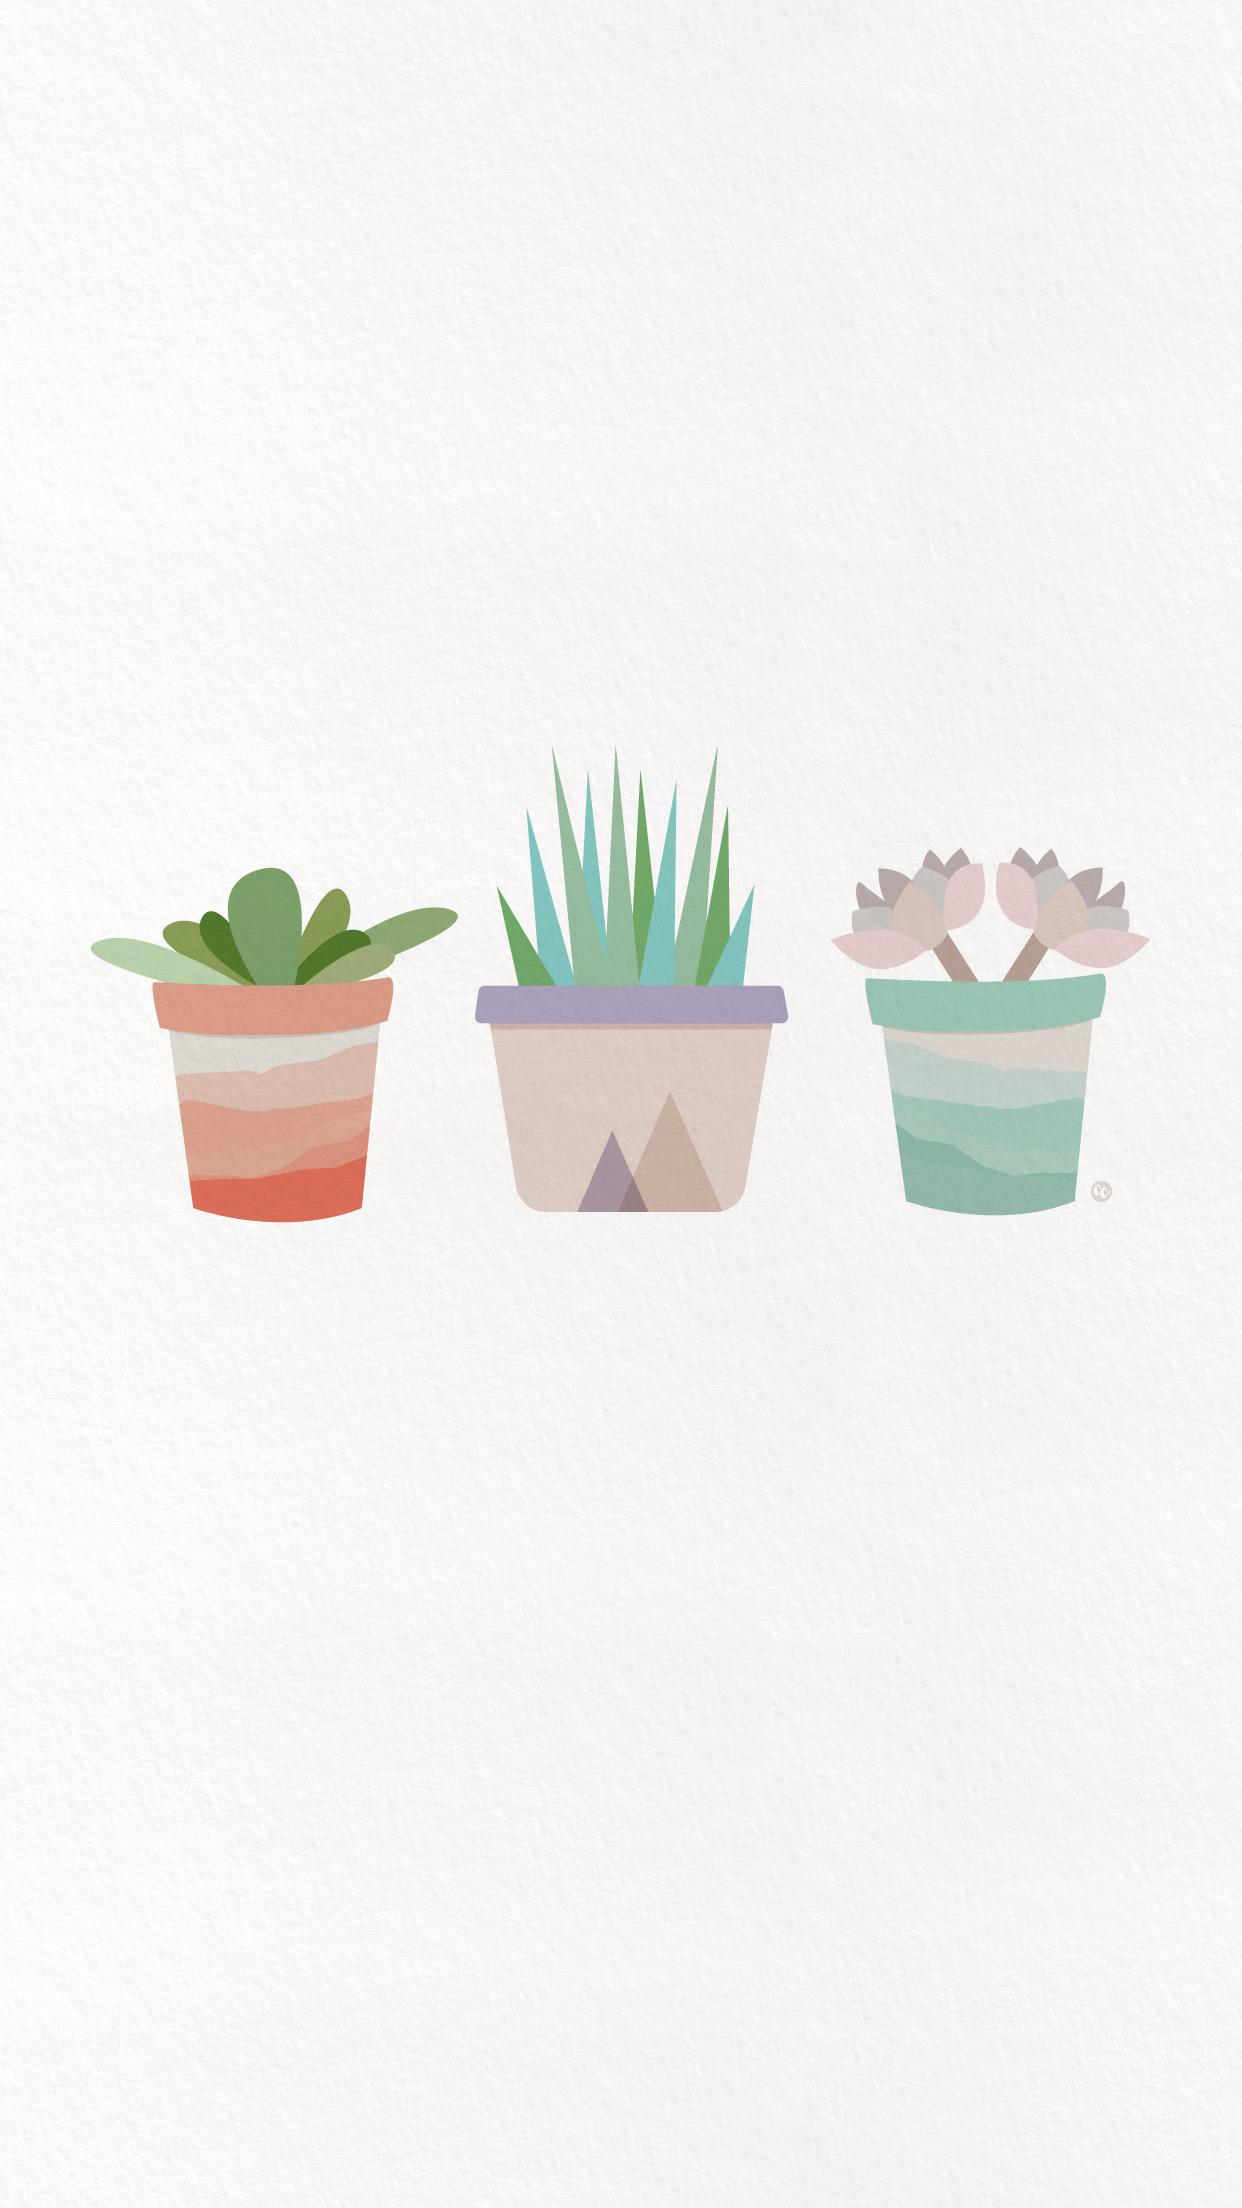 Fall Wallpaper With Verse Free Desktop Wallpaper Succulents